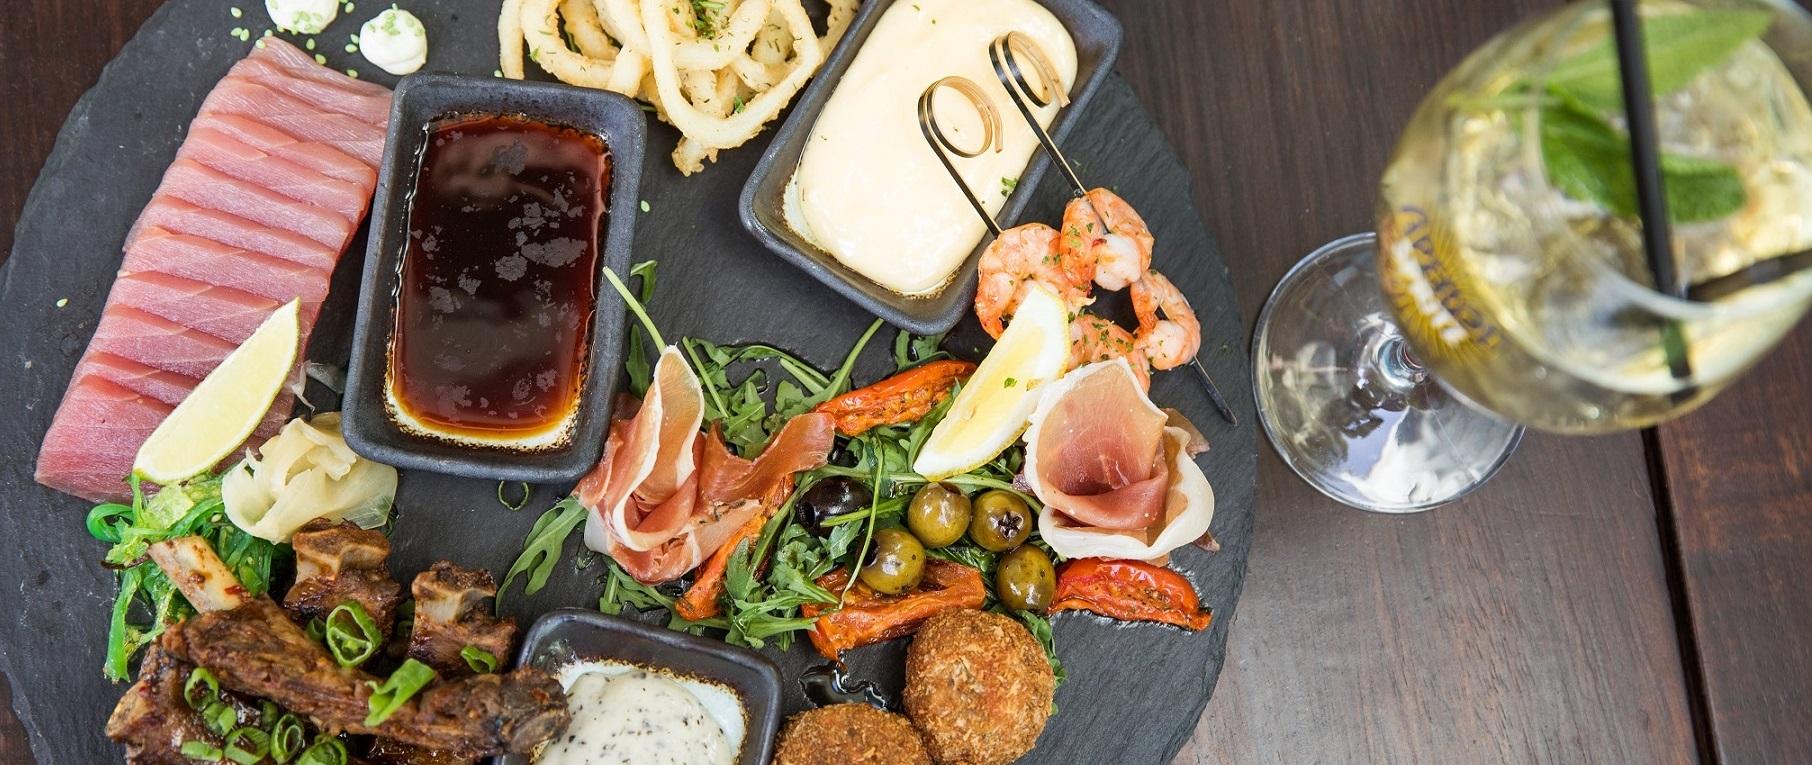 berlage-foodsharing